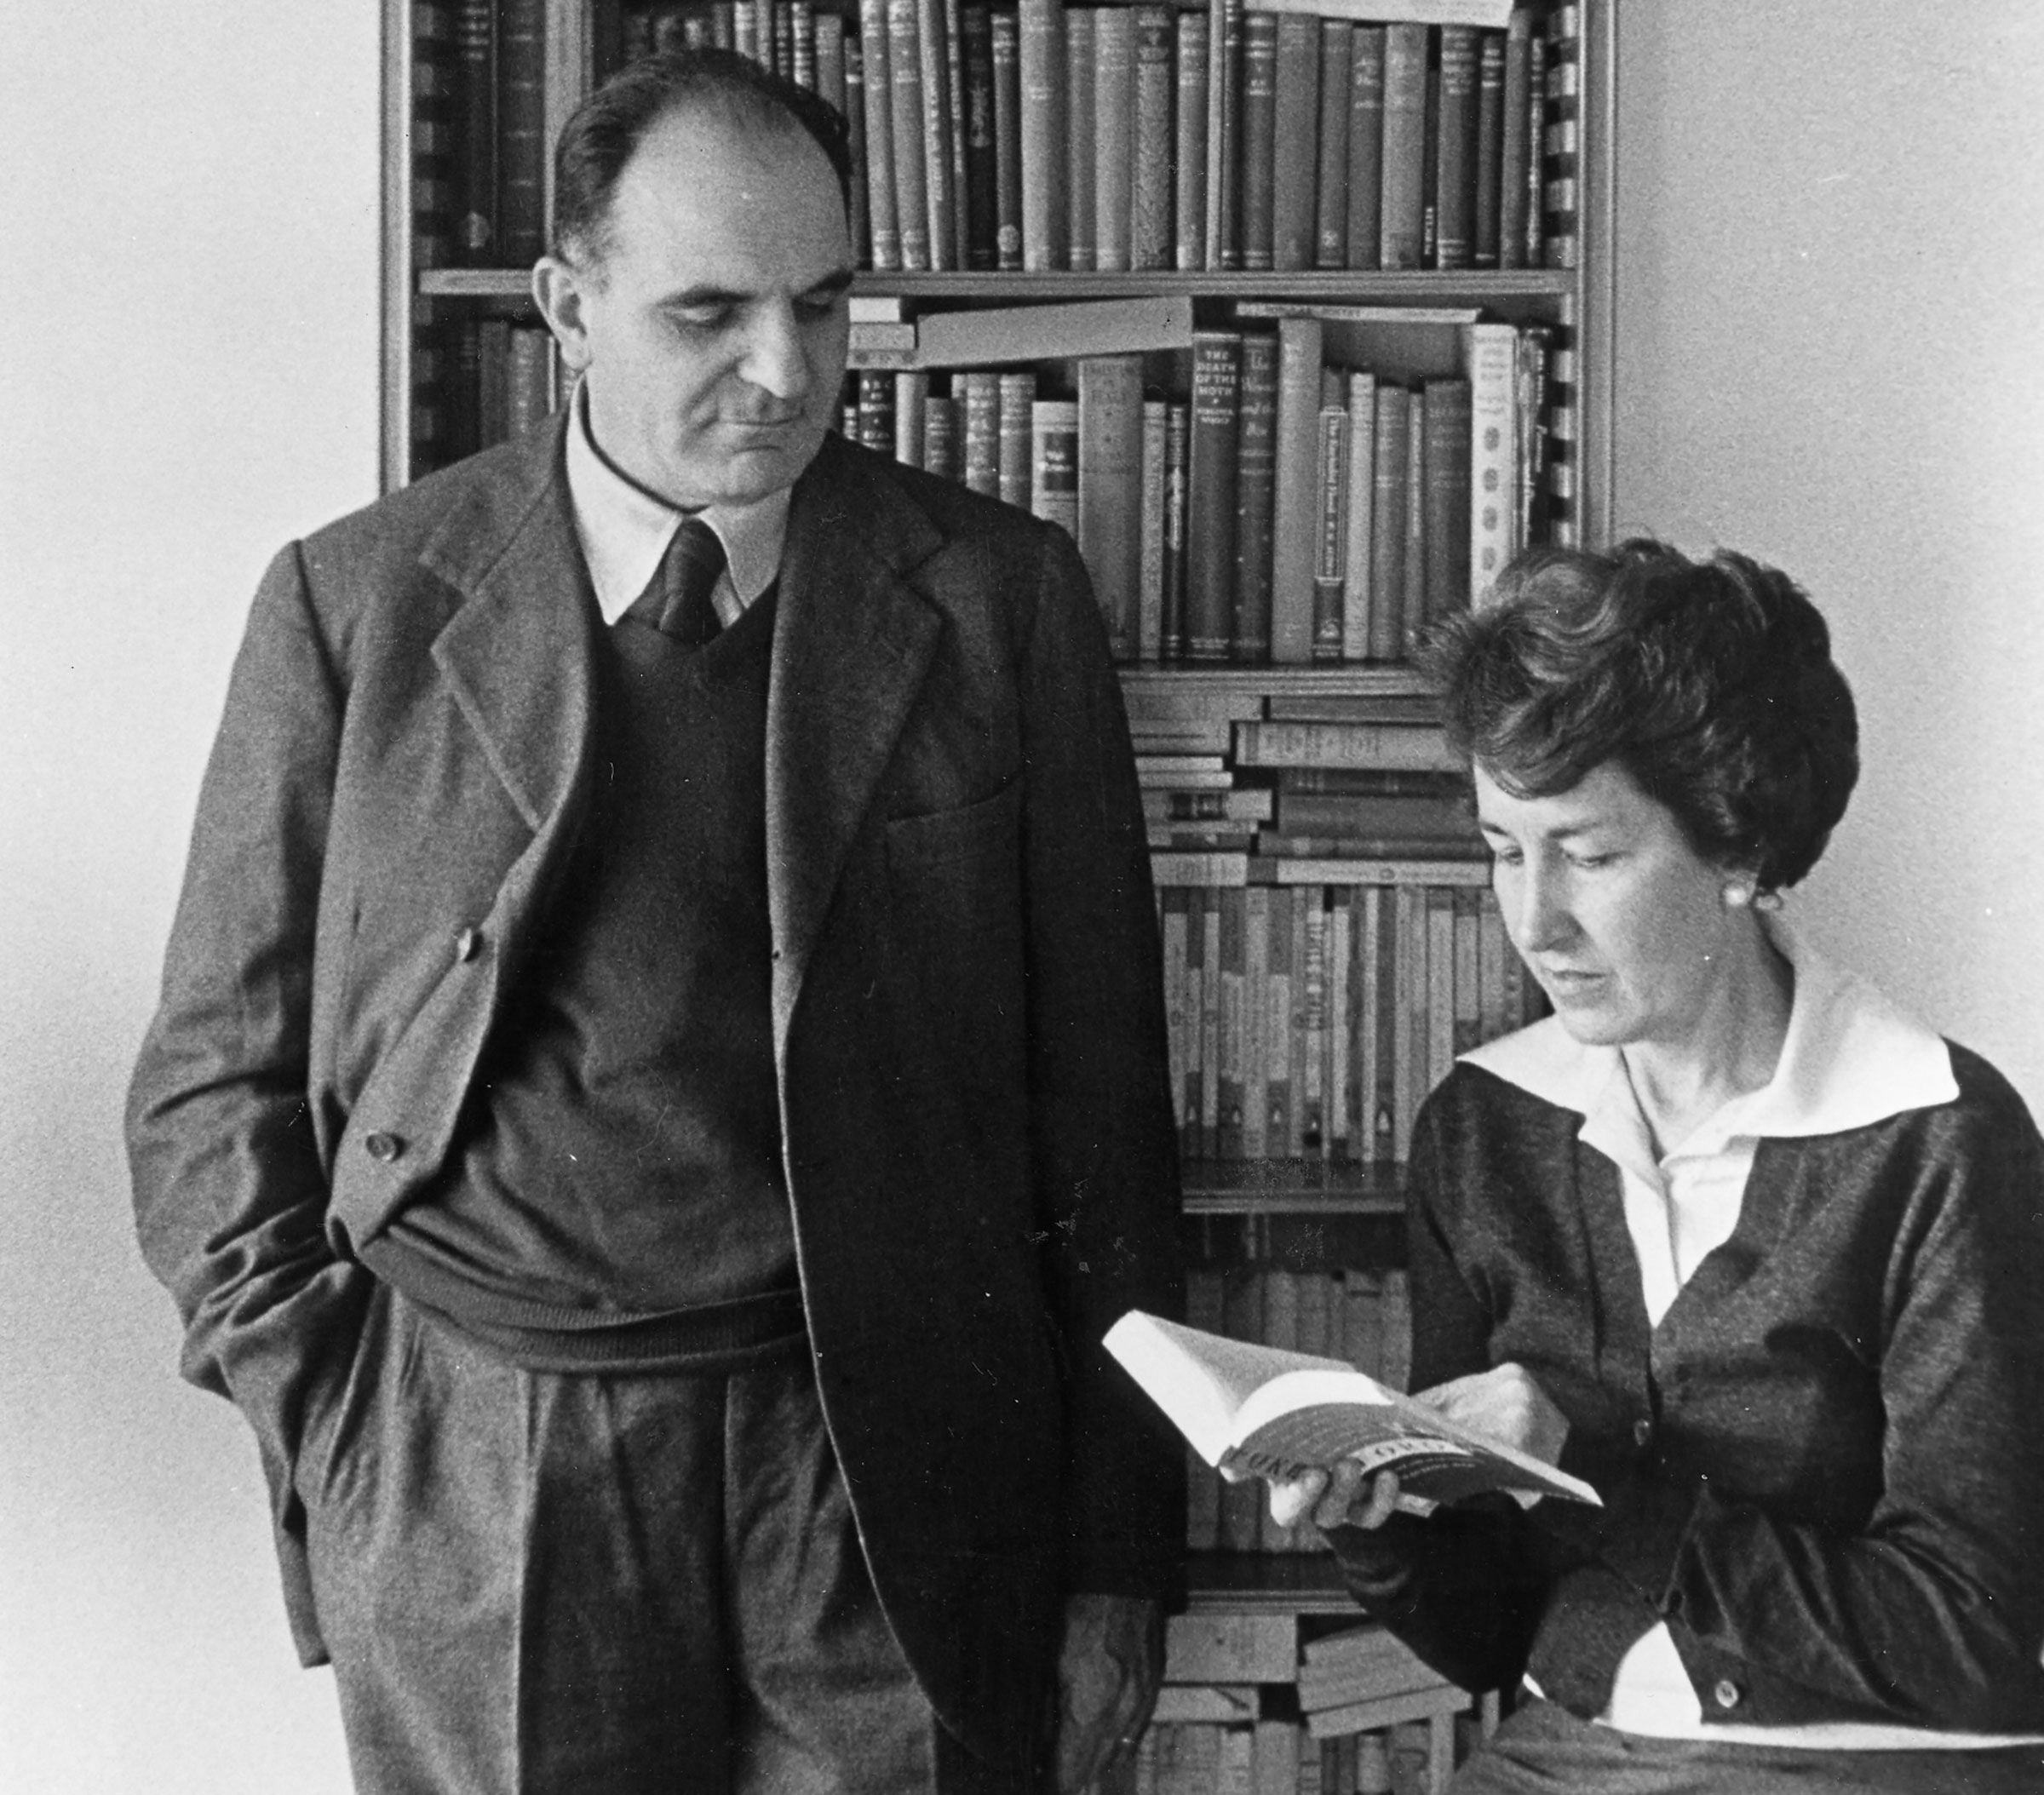 Attilio Bertolucci amb Ninetta Giovanardi, esposa del poeta